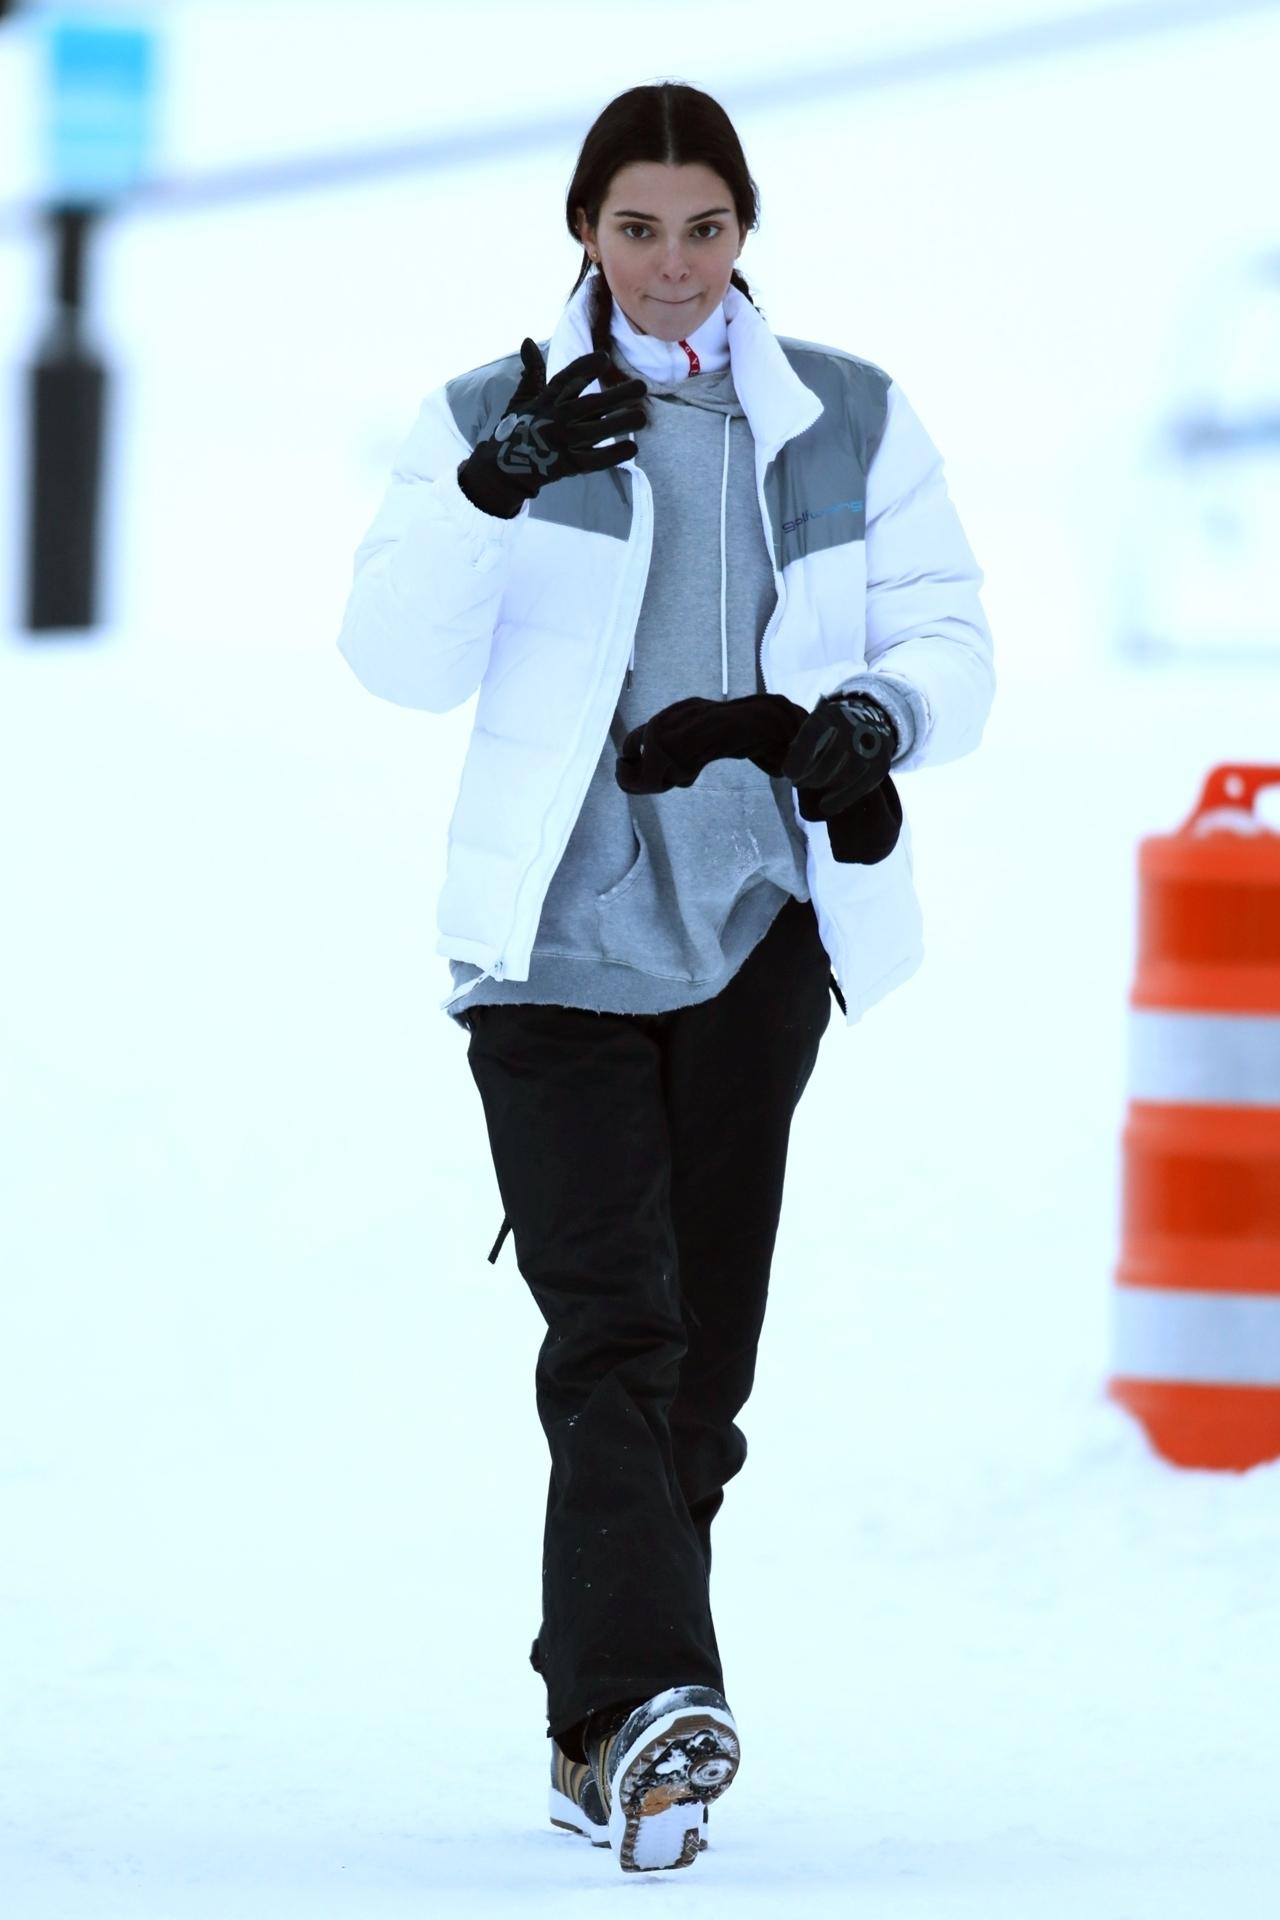 sweater kendall jenner kardashians pants celebrity jacket winter jacket